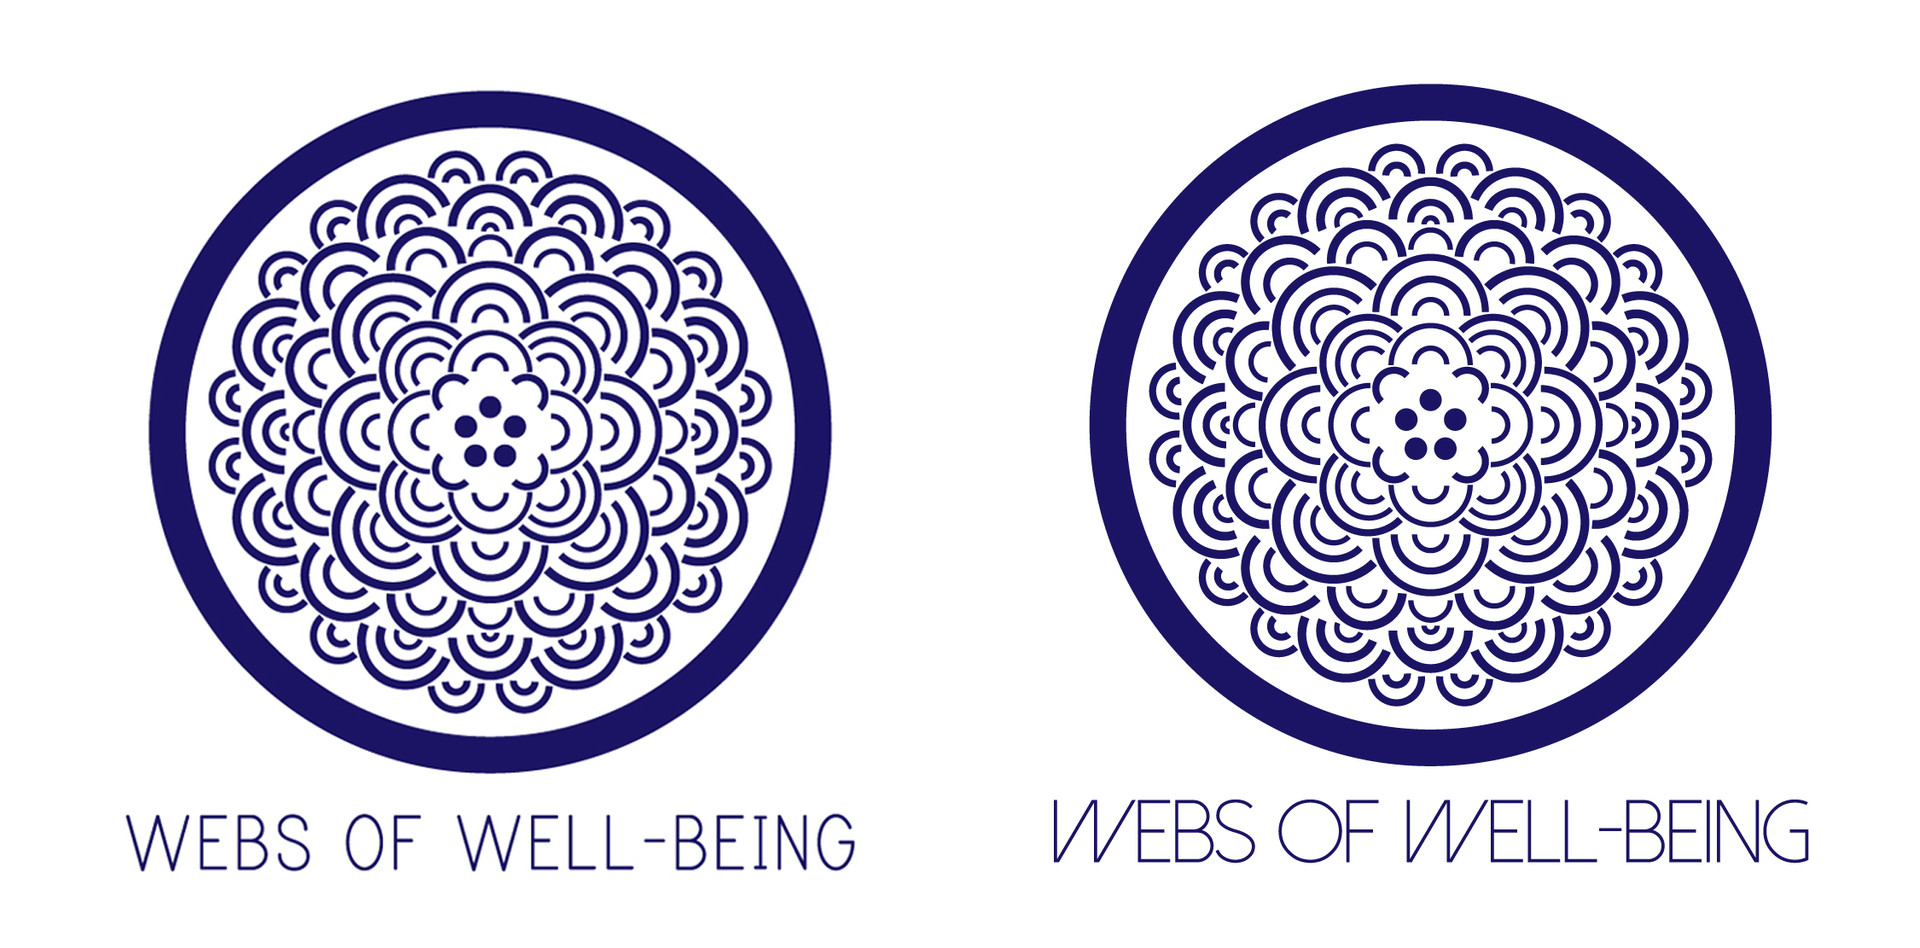 webs of well-being logo design (3/3)